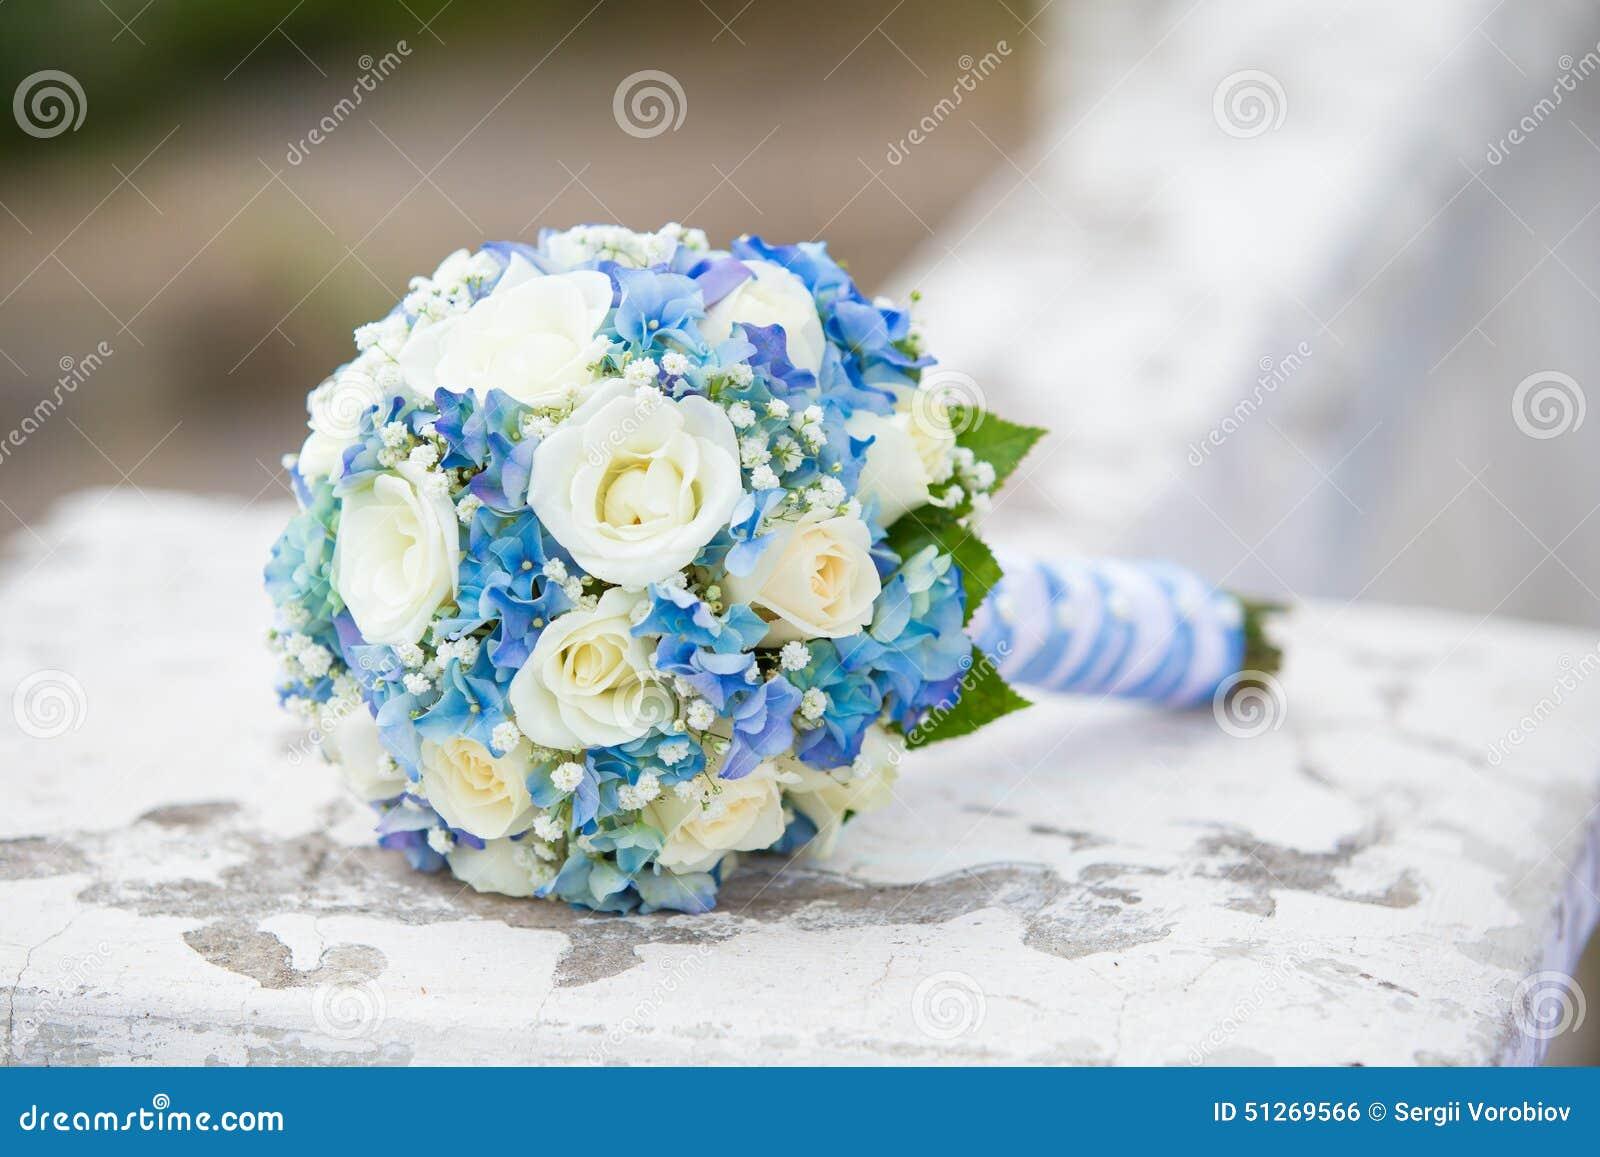 Wedding flowers stock photo image of elegant white 51269566 wedding flowers izmirmasajfo